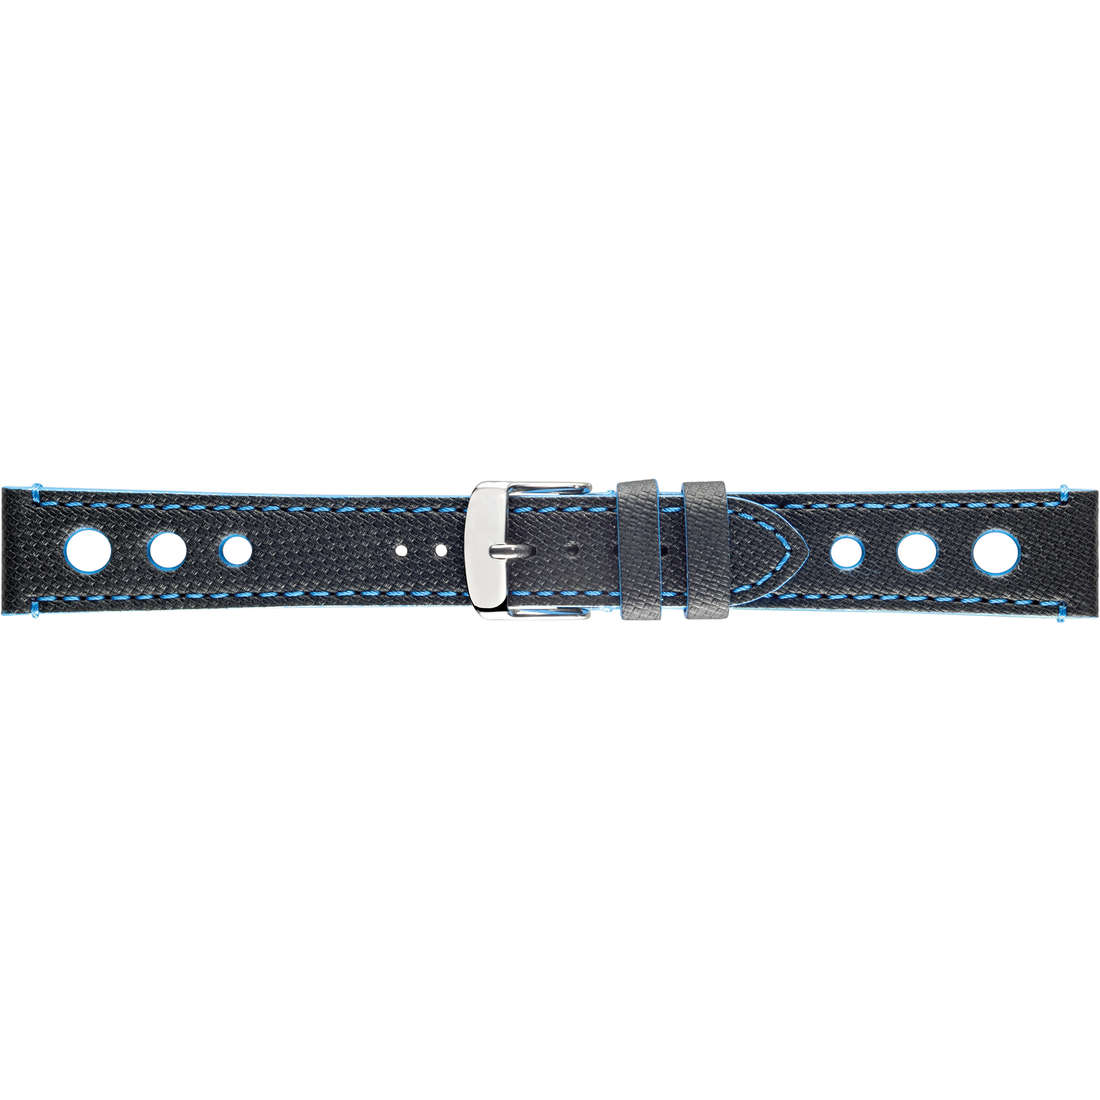 montre bande de montres homme Morellato Linea Sport A01X4498B24866CR18